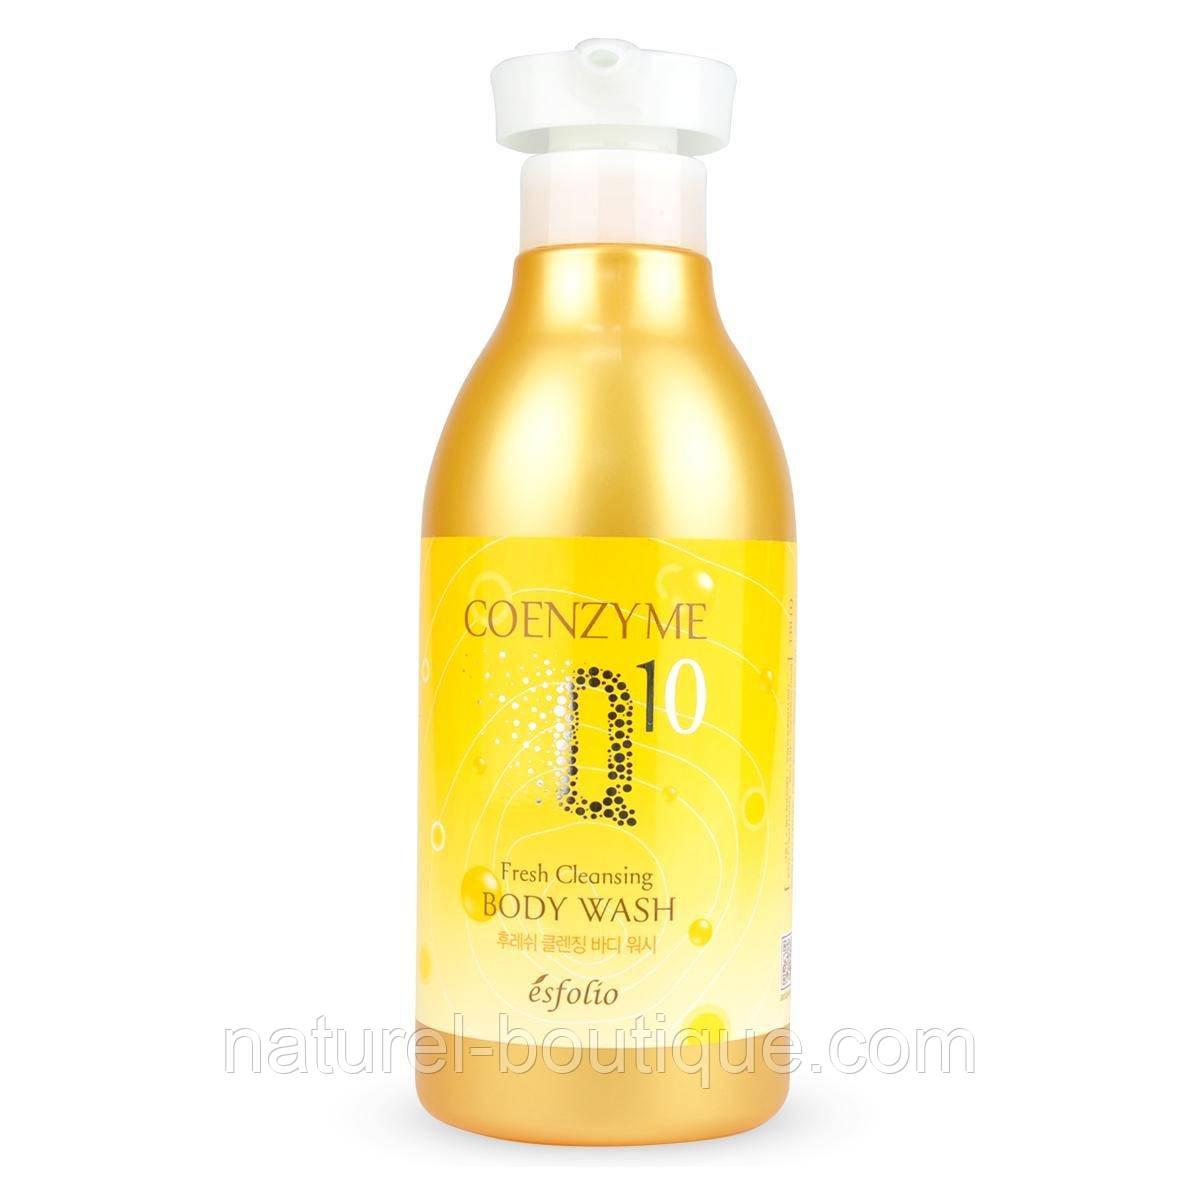 Гель для душа Esfolio Coenzyme Q10 Fresh Cleansing Body Wash  с коэнзимом Q10